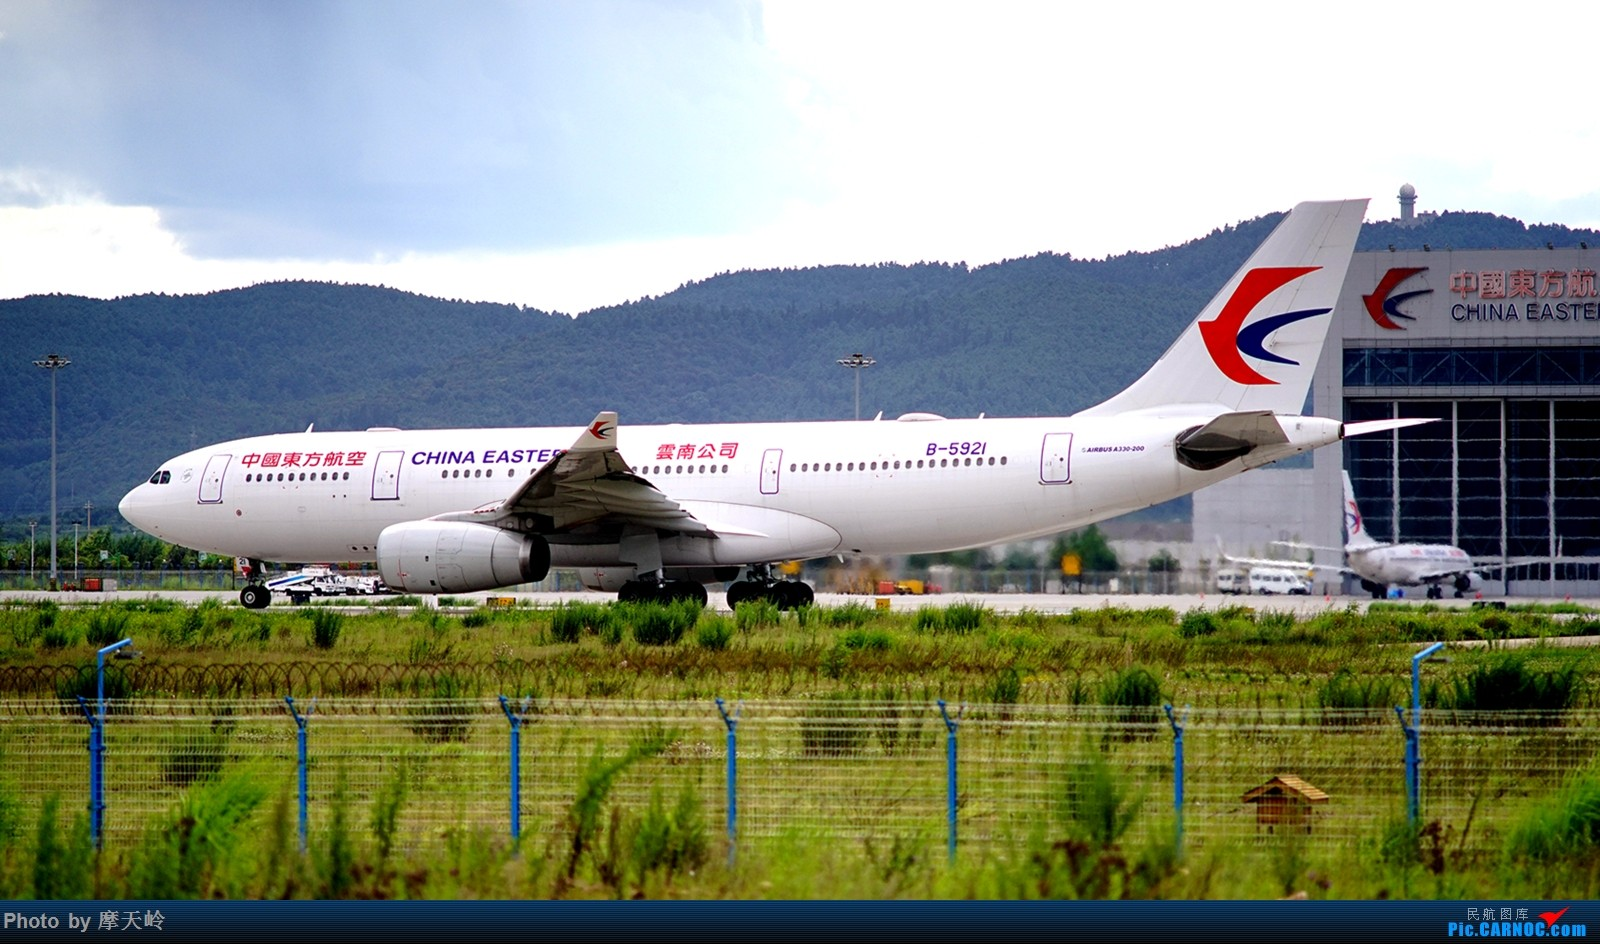 Re:[原创]kmg 长水东跑道 AIRBUS A330-200 B-5921 中国昆明长水国际机场